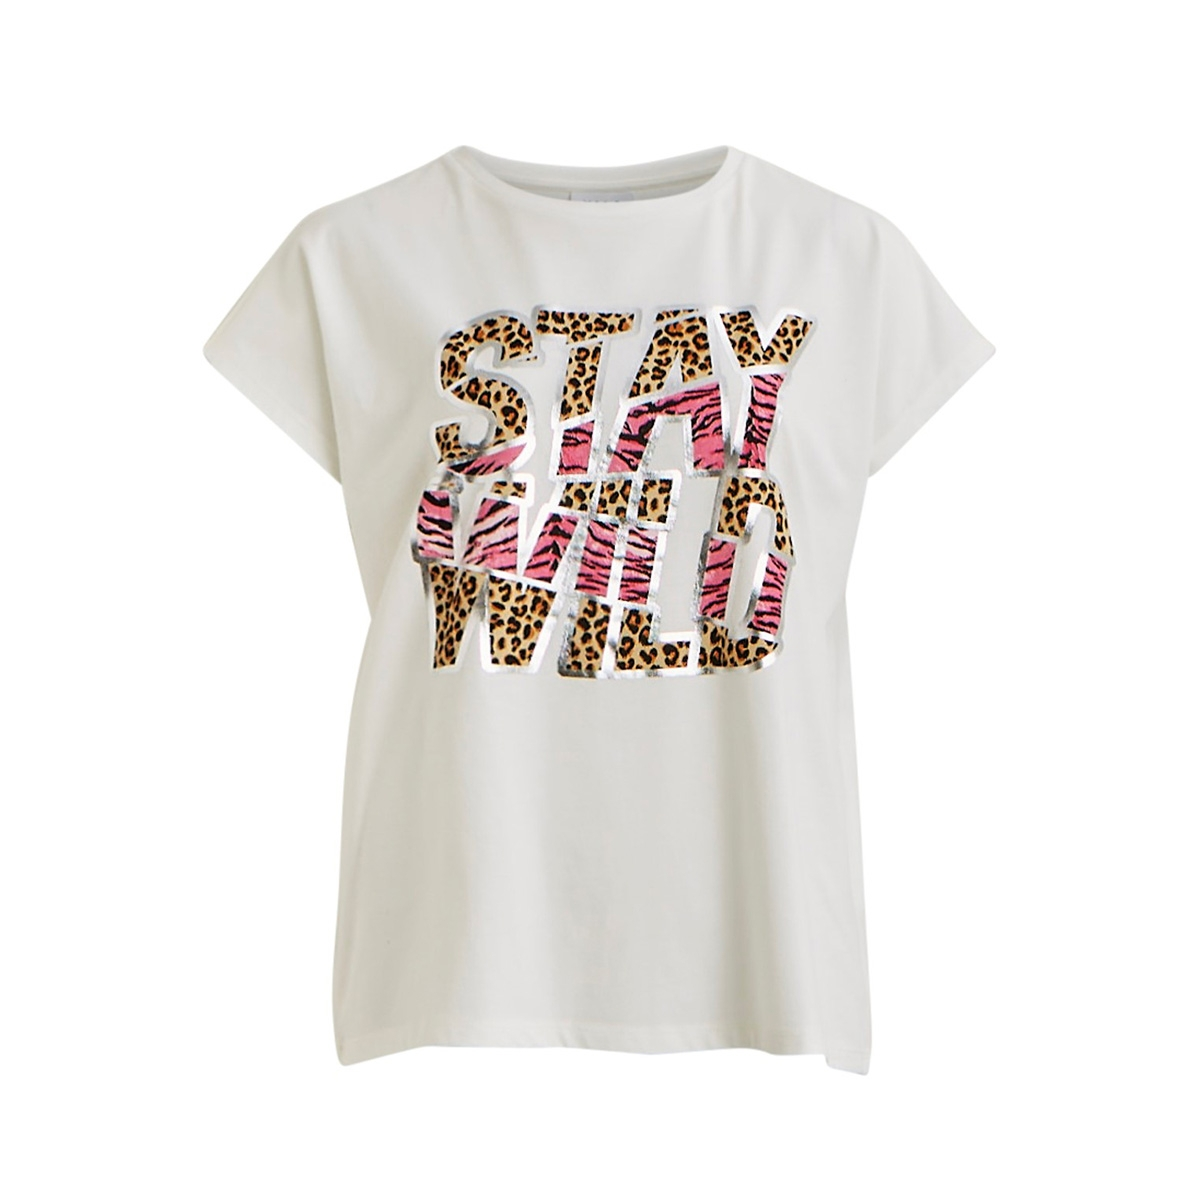 vitta t-shirt /rx 14056334 vila t-shirt cloud dancer/stay wild